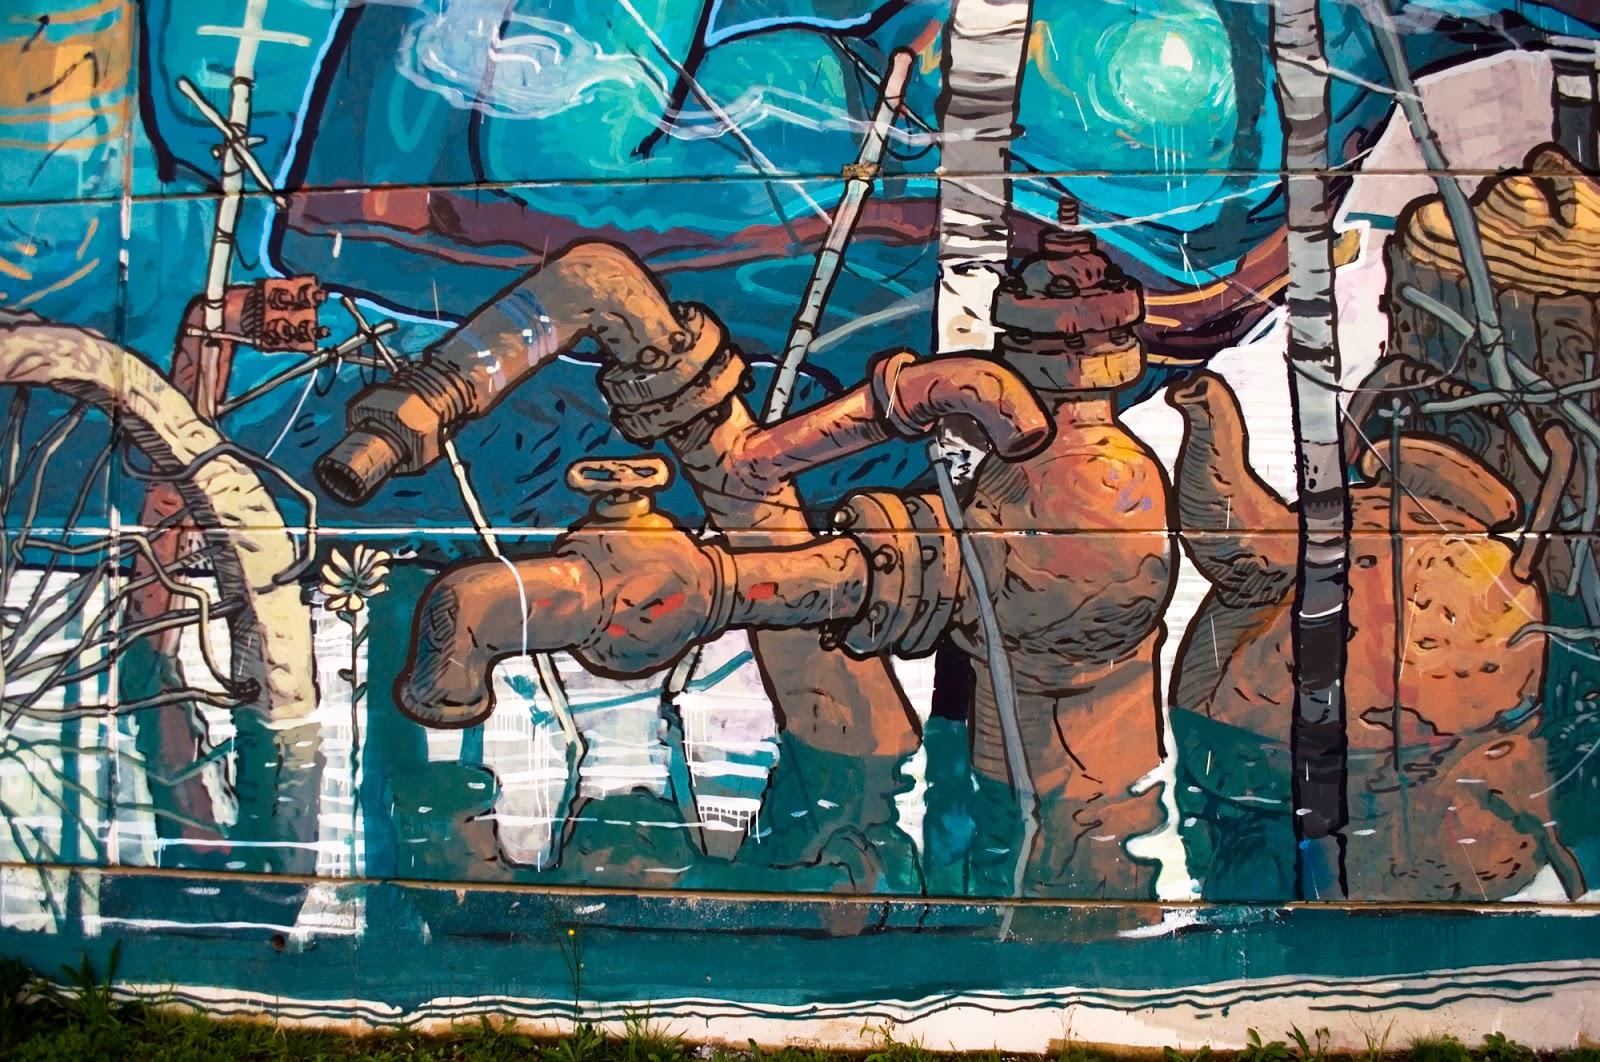 Riquiño-new-mural-at-desordes-creativas-2013-08